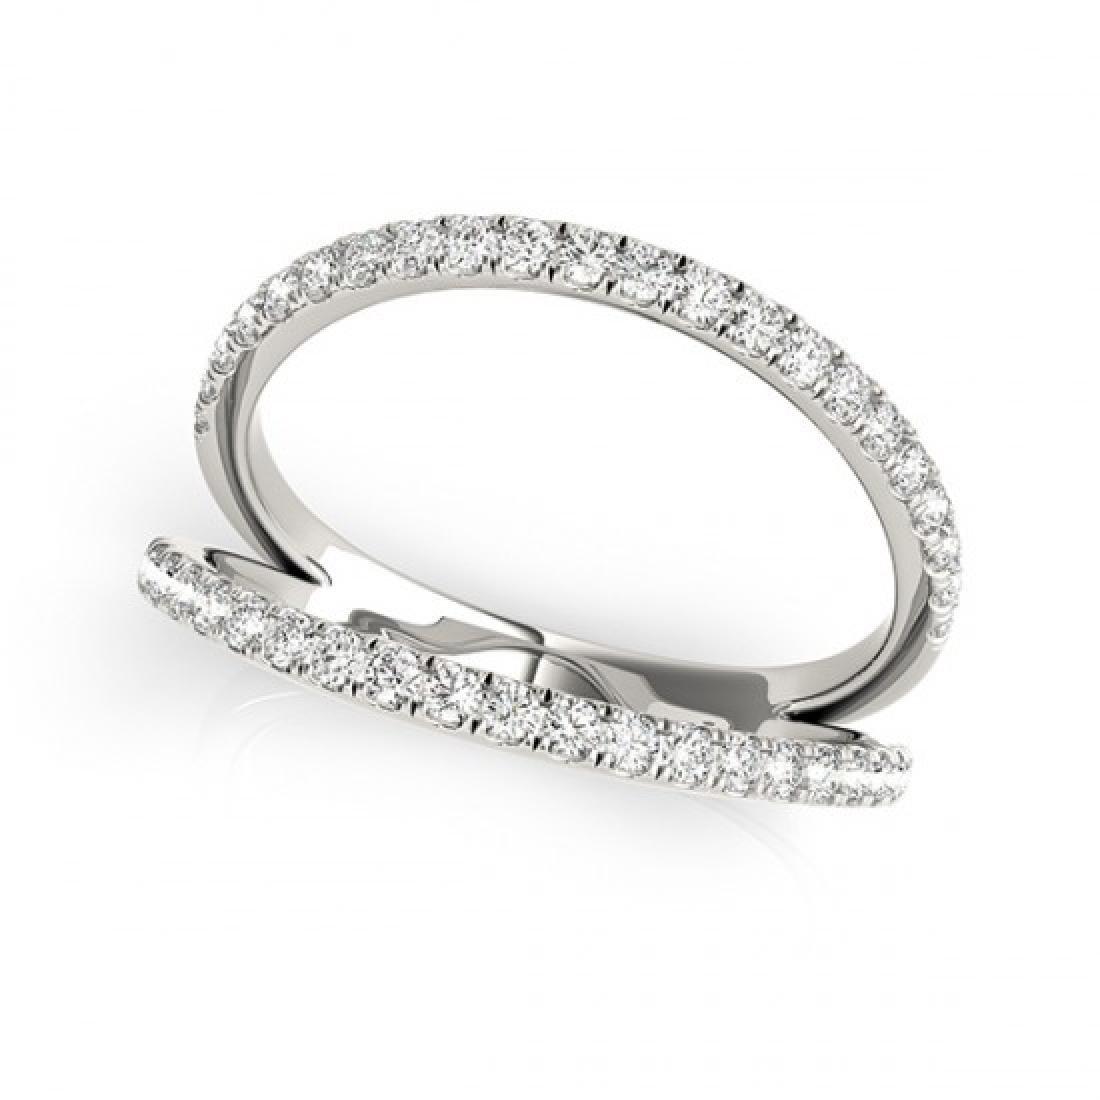 0.33 CTW Certified VS/SI Diamond Fashion Ring 14K White - 2